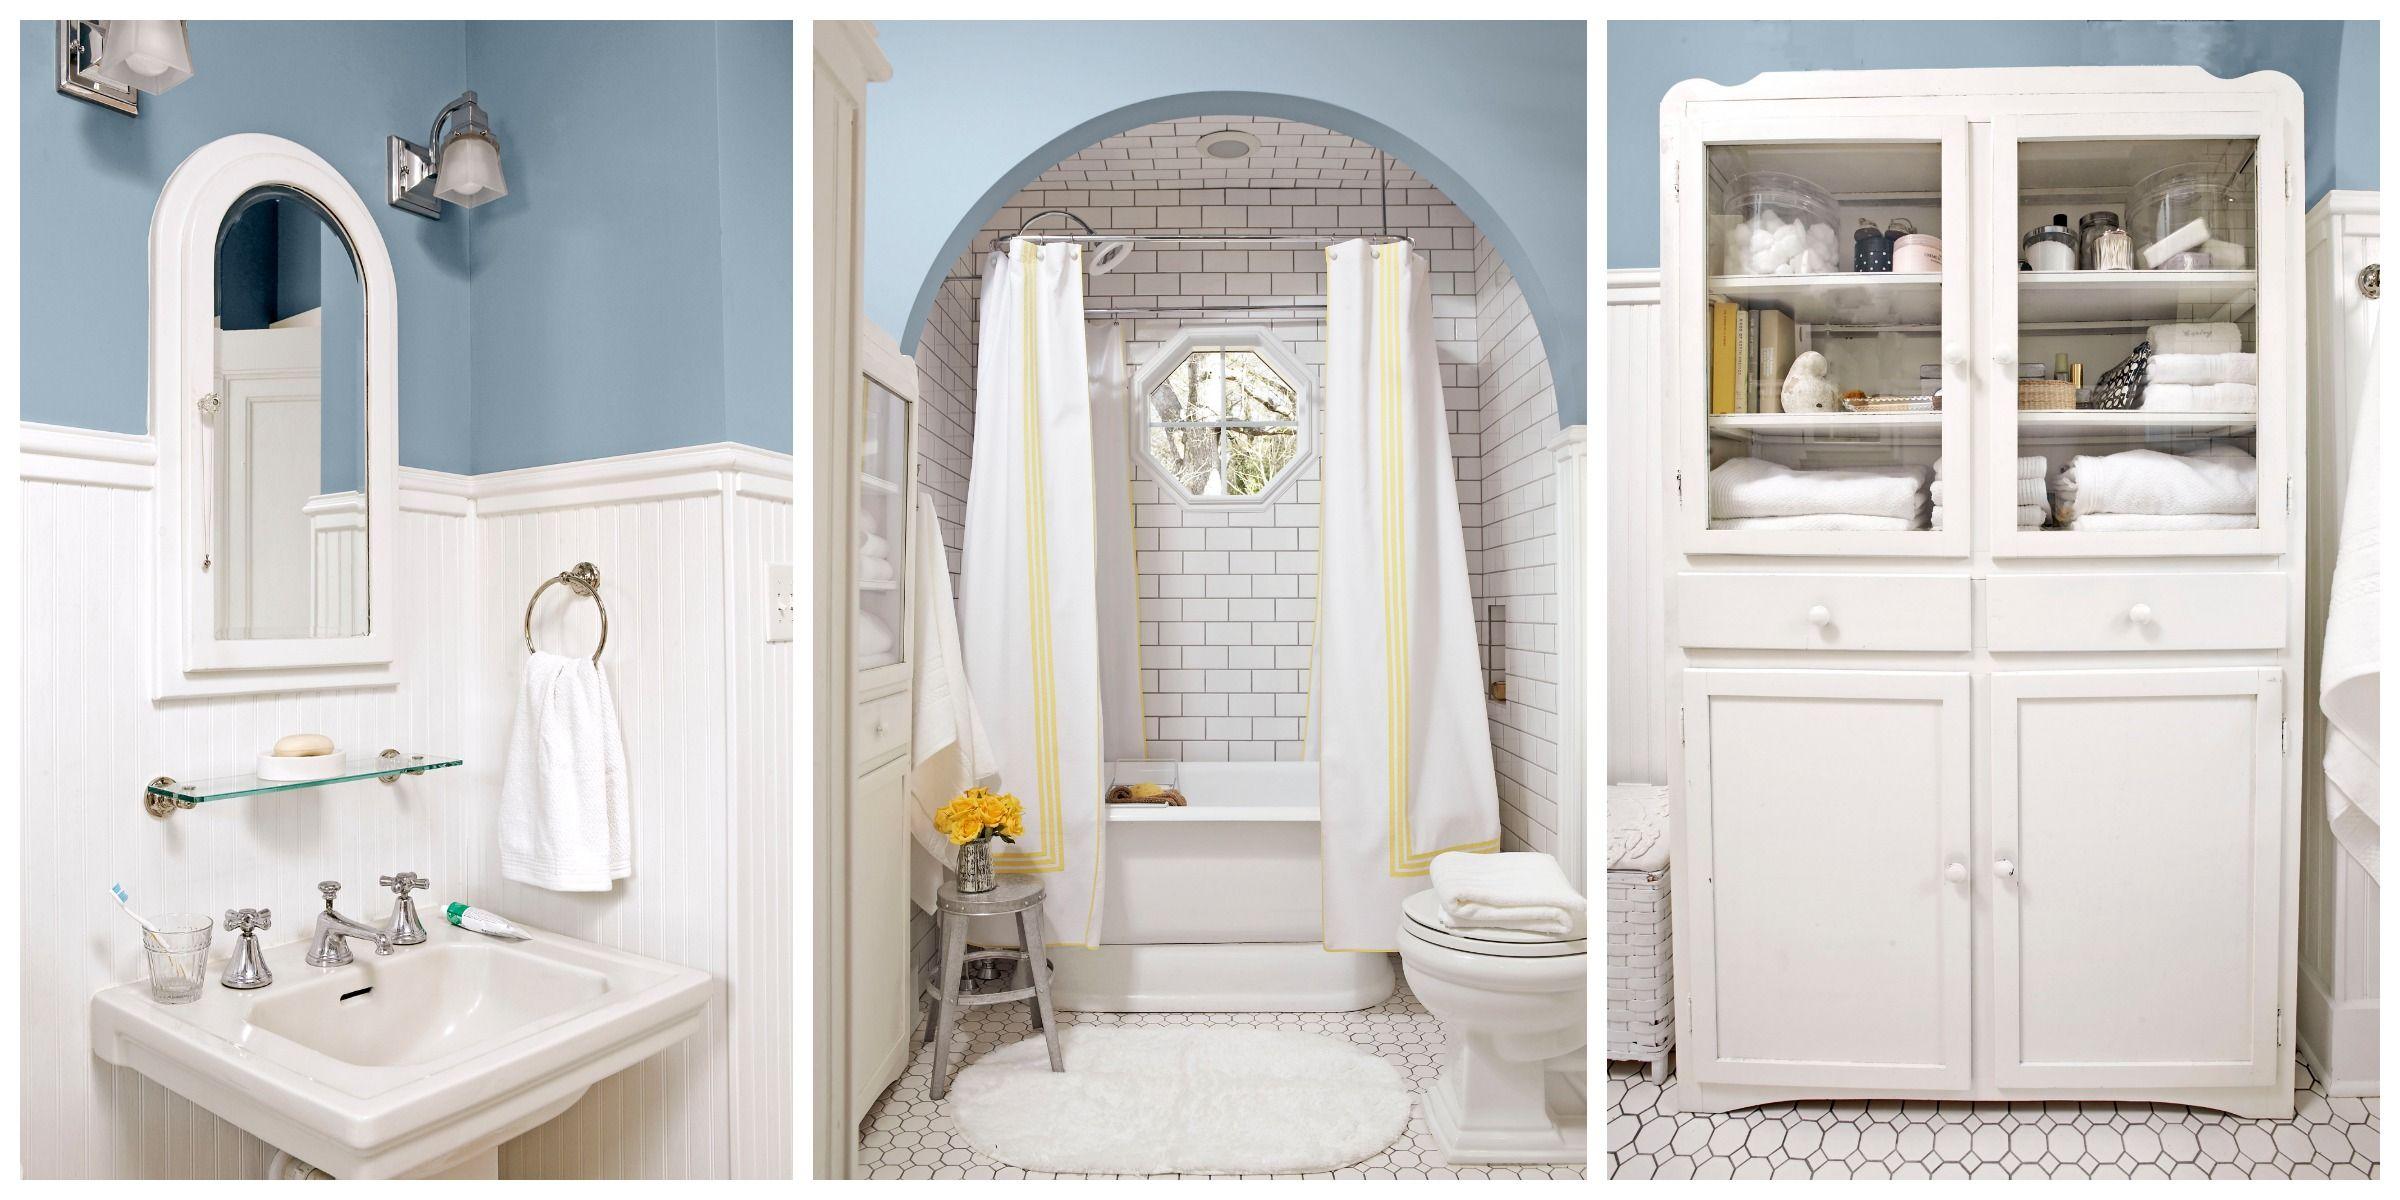 9 Steps to a Brilliant Bathroom Makeover - Cheap Bathroom Renovation ...